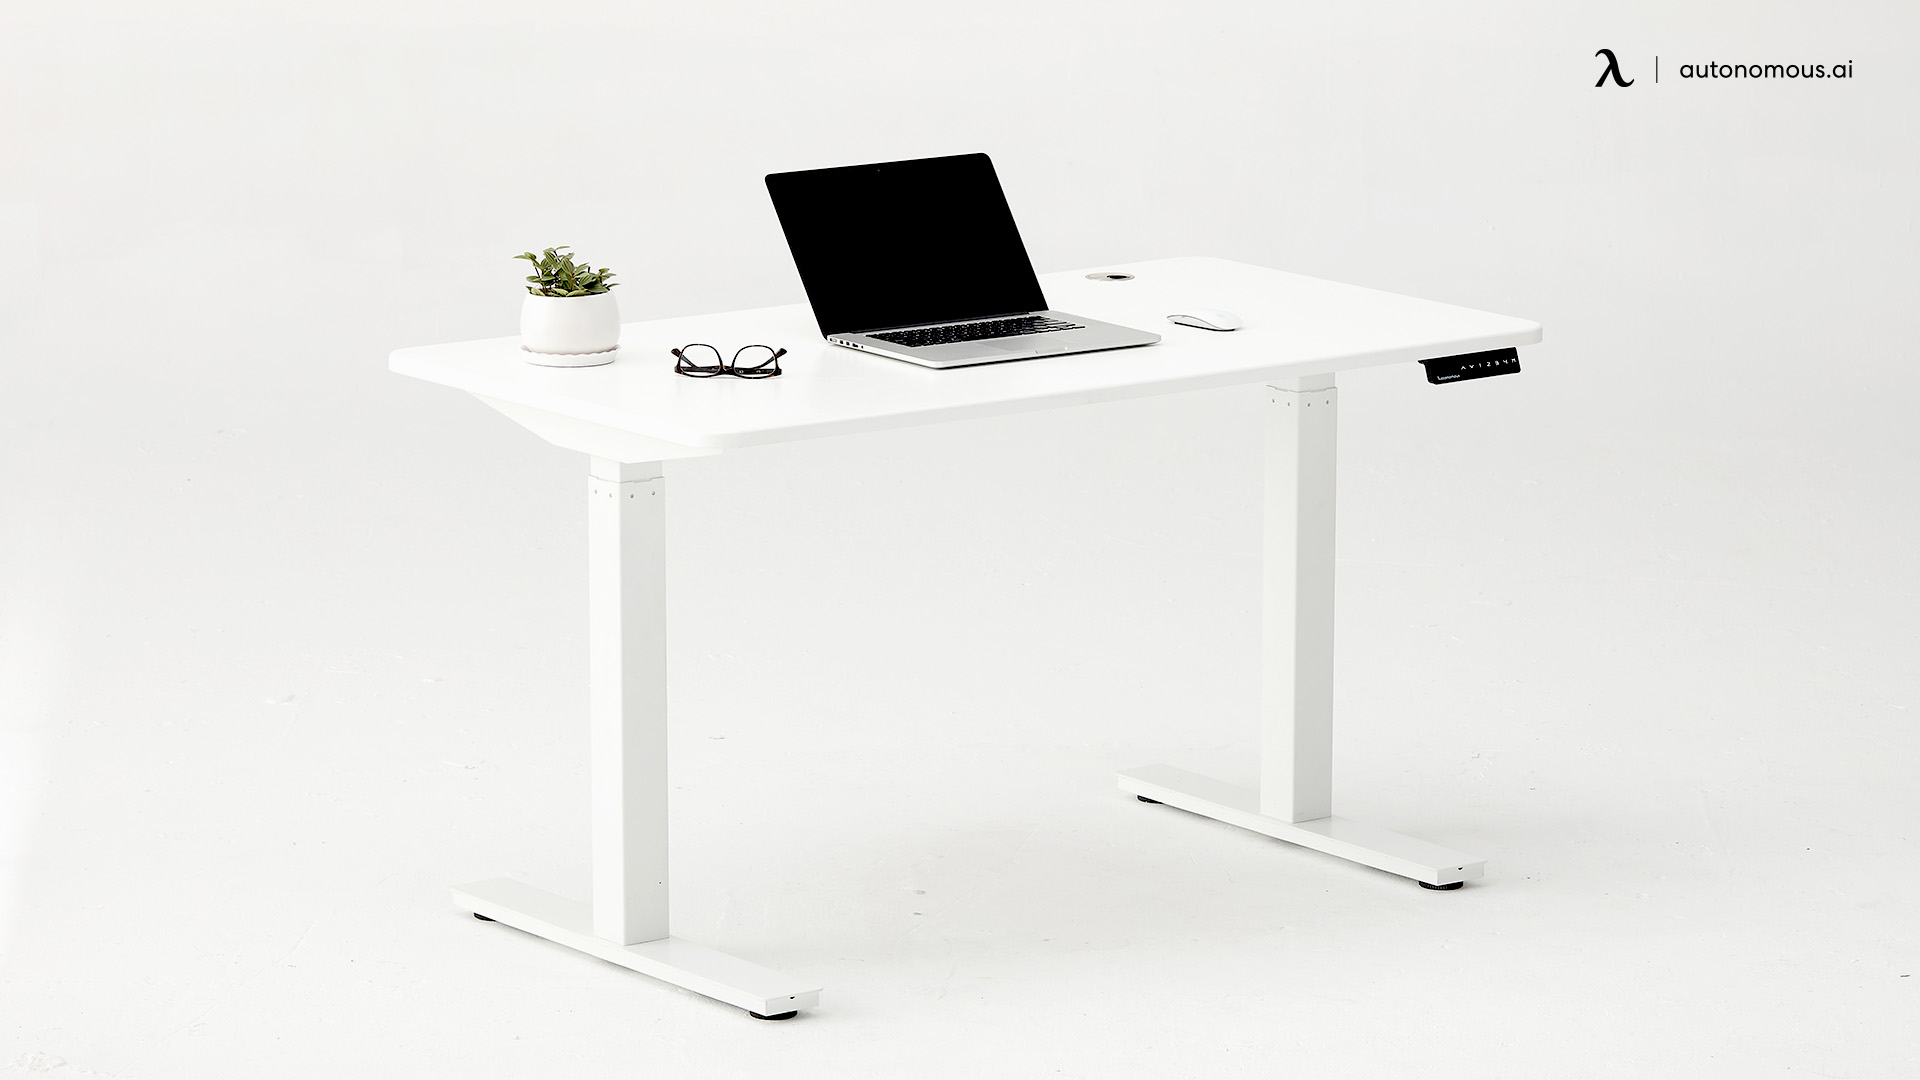 Best White Office Desk for Home SmartDesk 2 from Autonomous